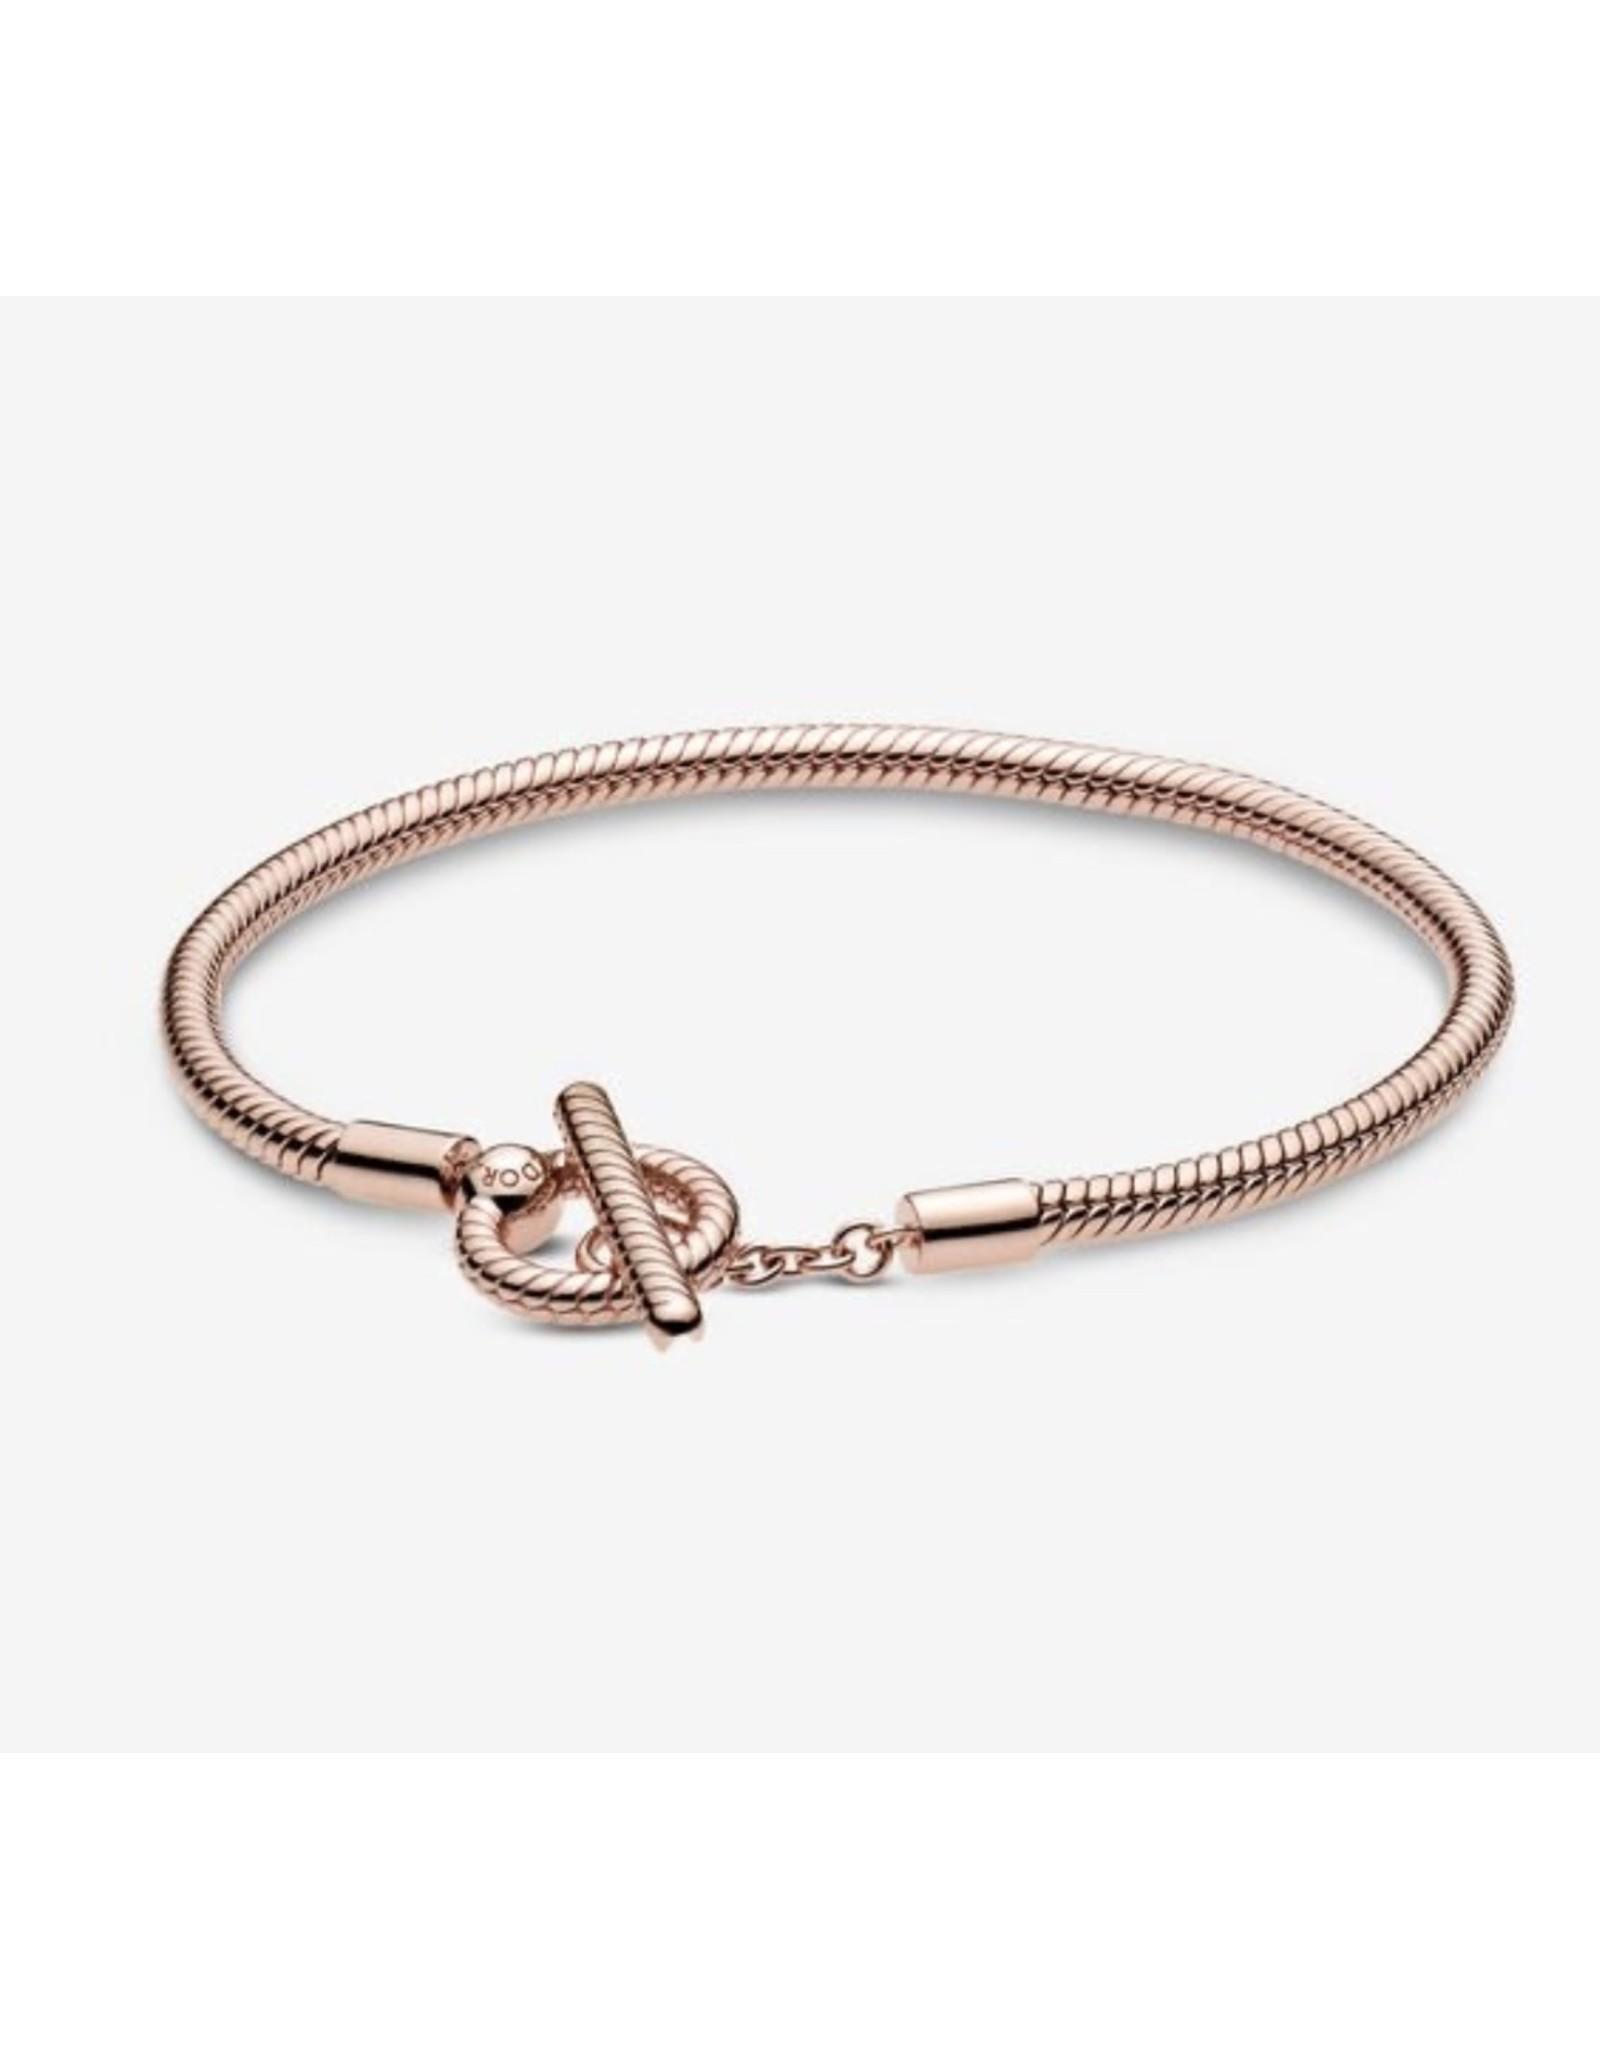 Pandora Pandora Bracelet,589087C00,Moment T-Bar Snake Chain, Rose Gold